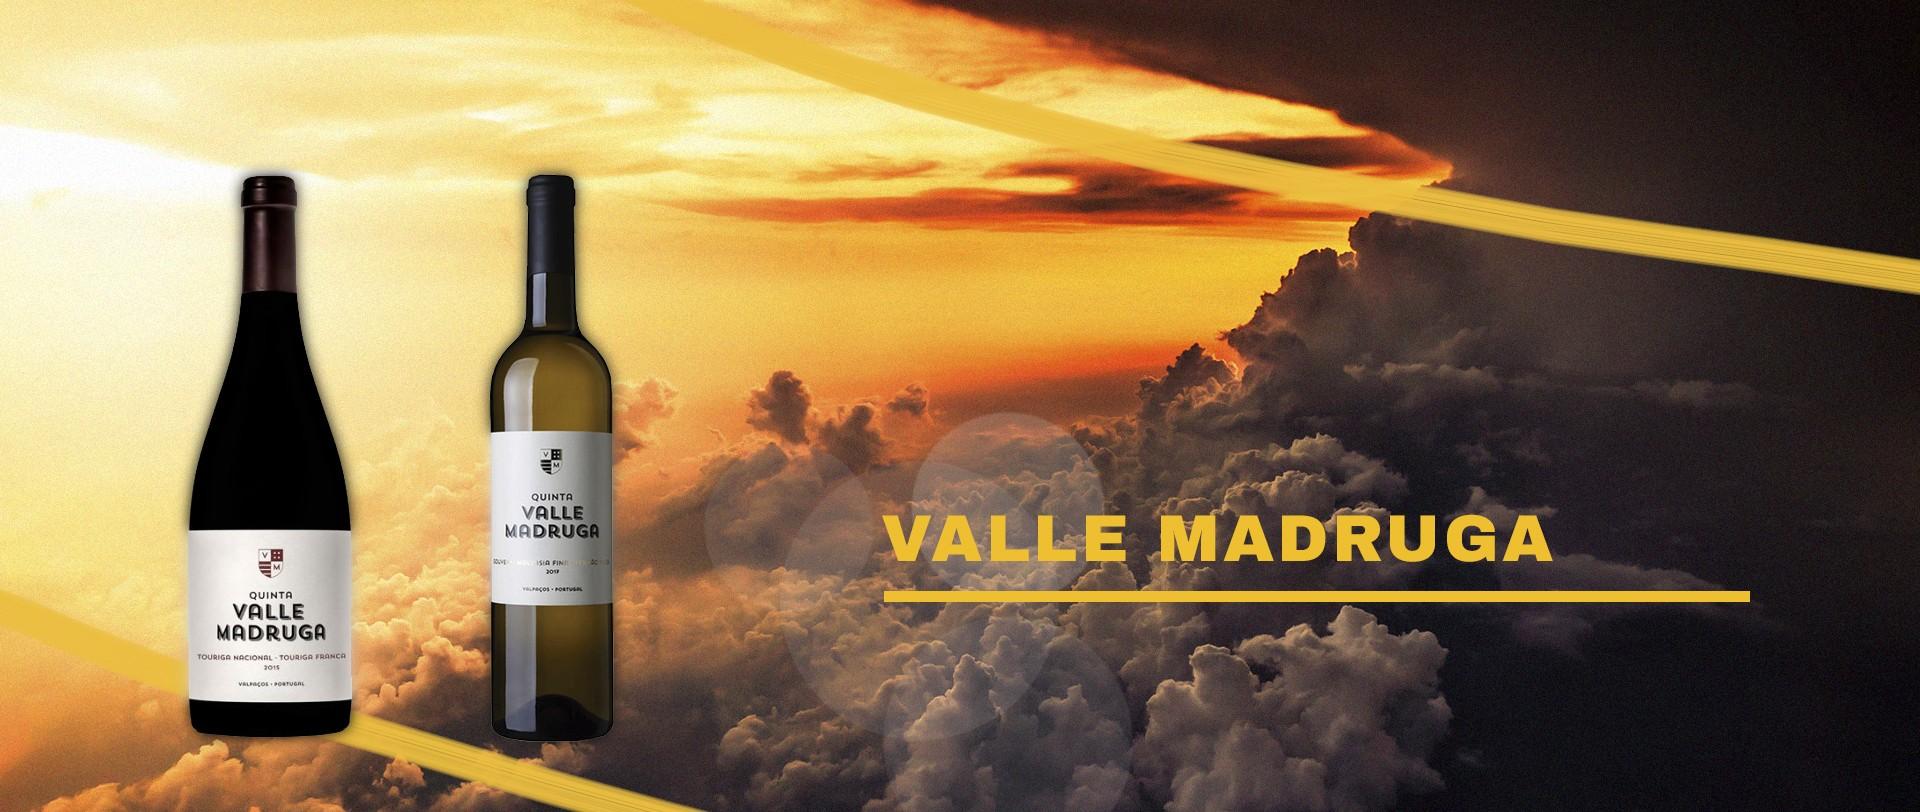 Valle Madruga